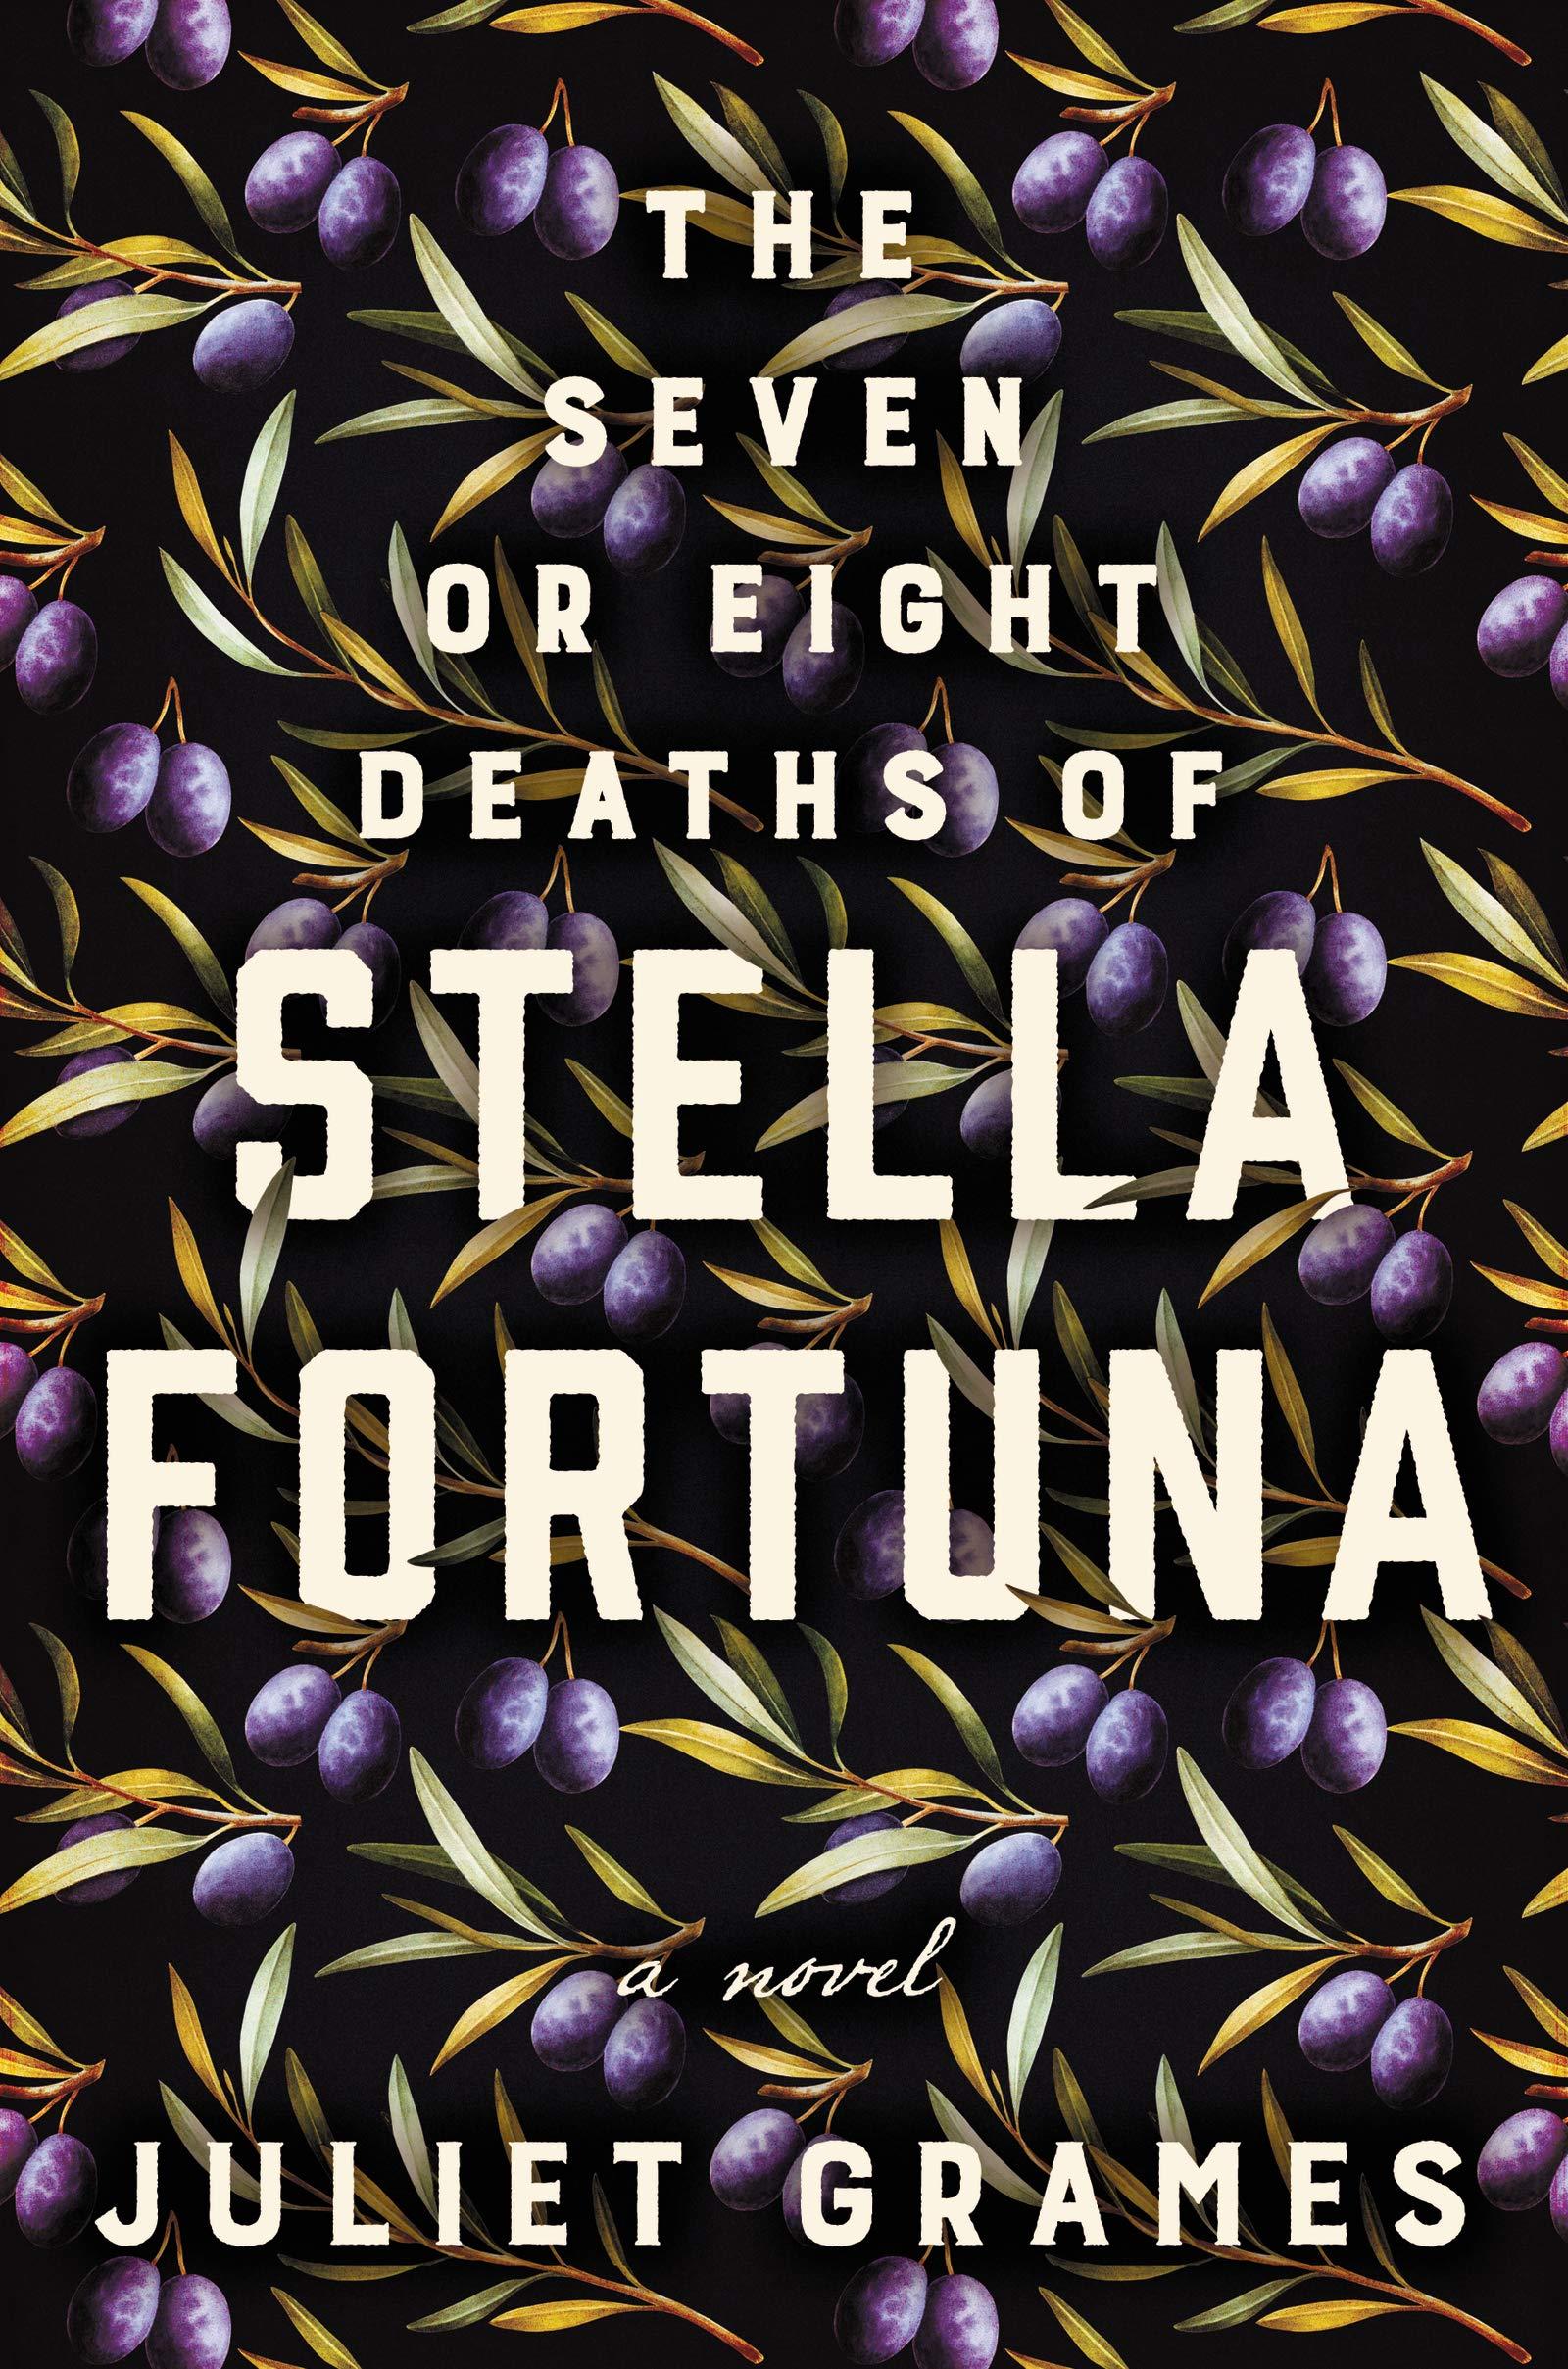 ویکالا · خرید  اصل اورجینال · خرید از آمازون · The Seven or Eight Deaths of Stella Fortuna: A Novel wekala · ویکالا